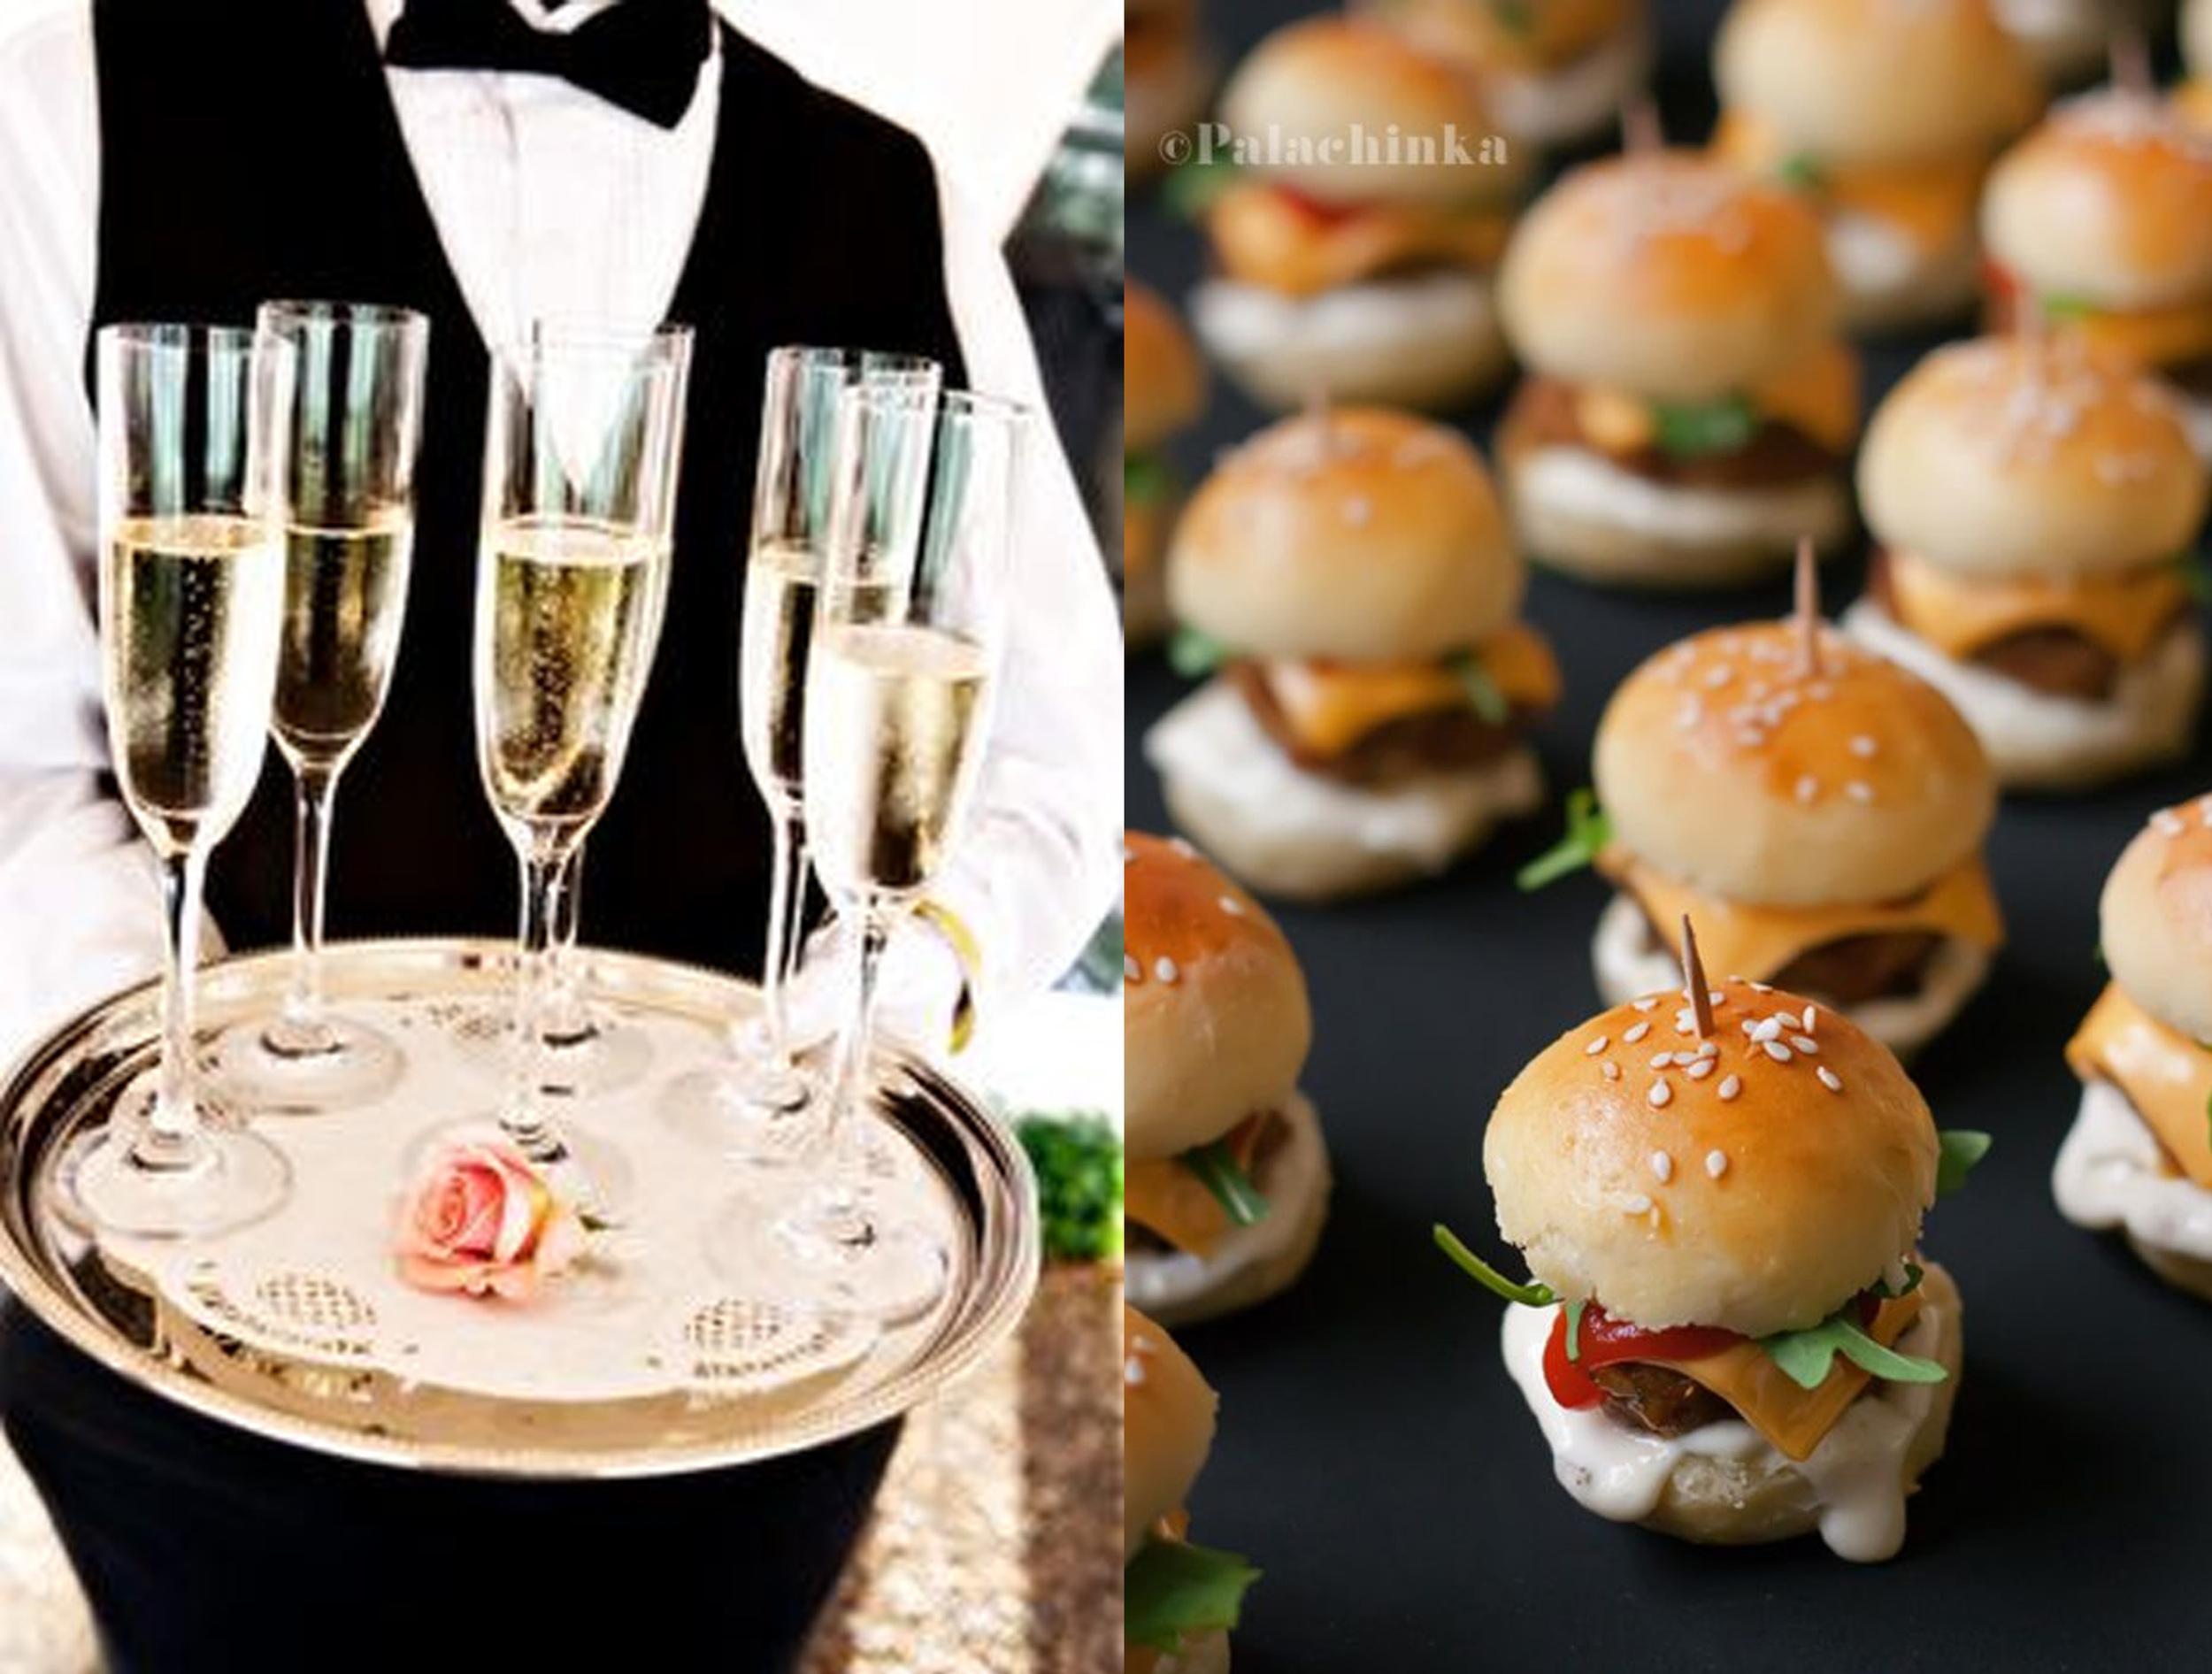 butler service  Pinterest  - finger food  Paybuzz